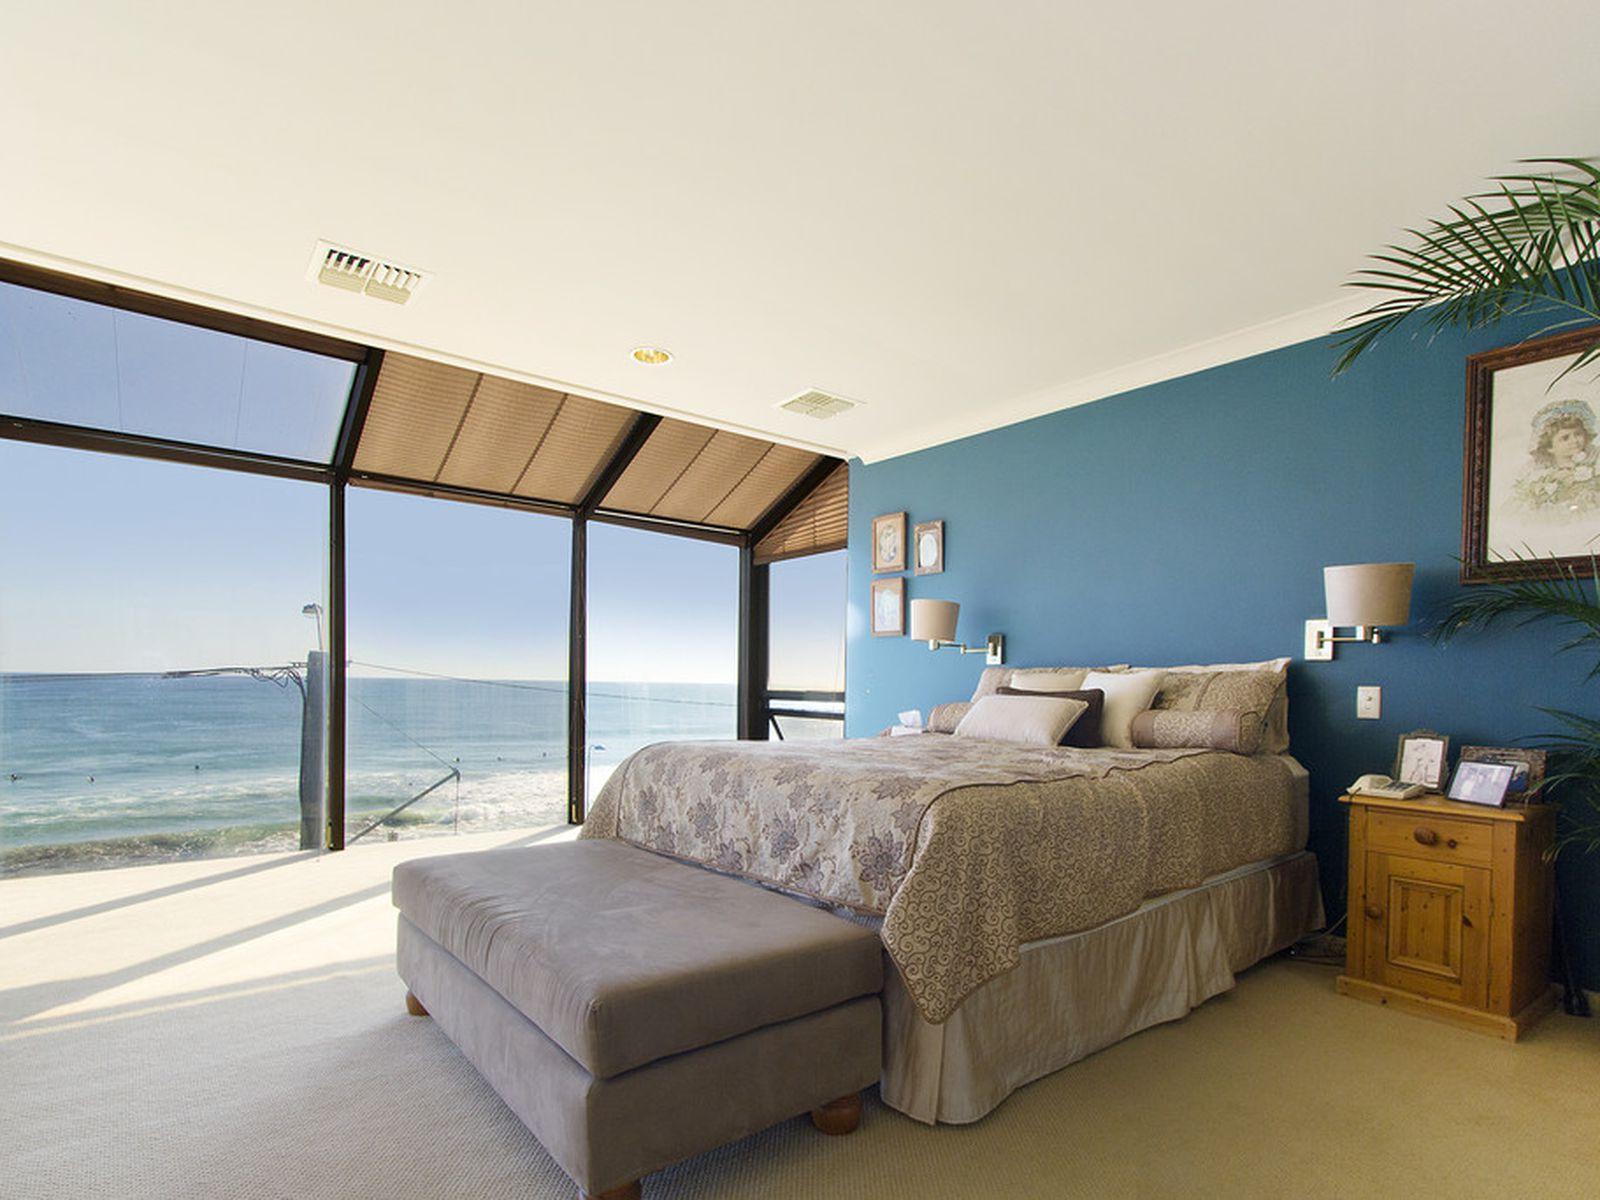 267 West Coast Drive, North Beach